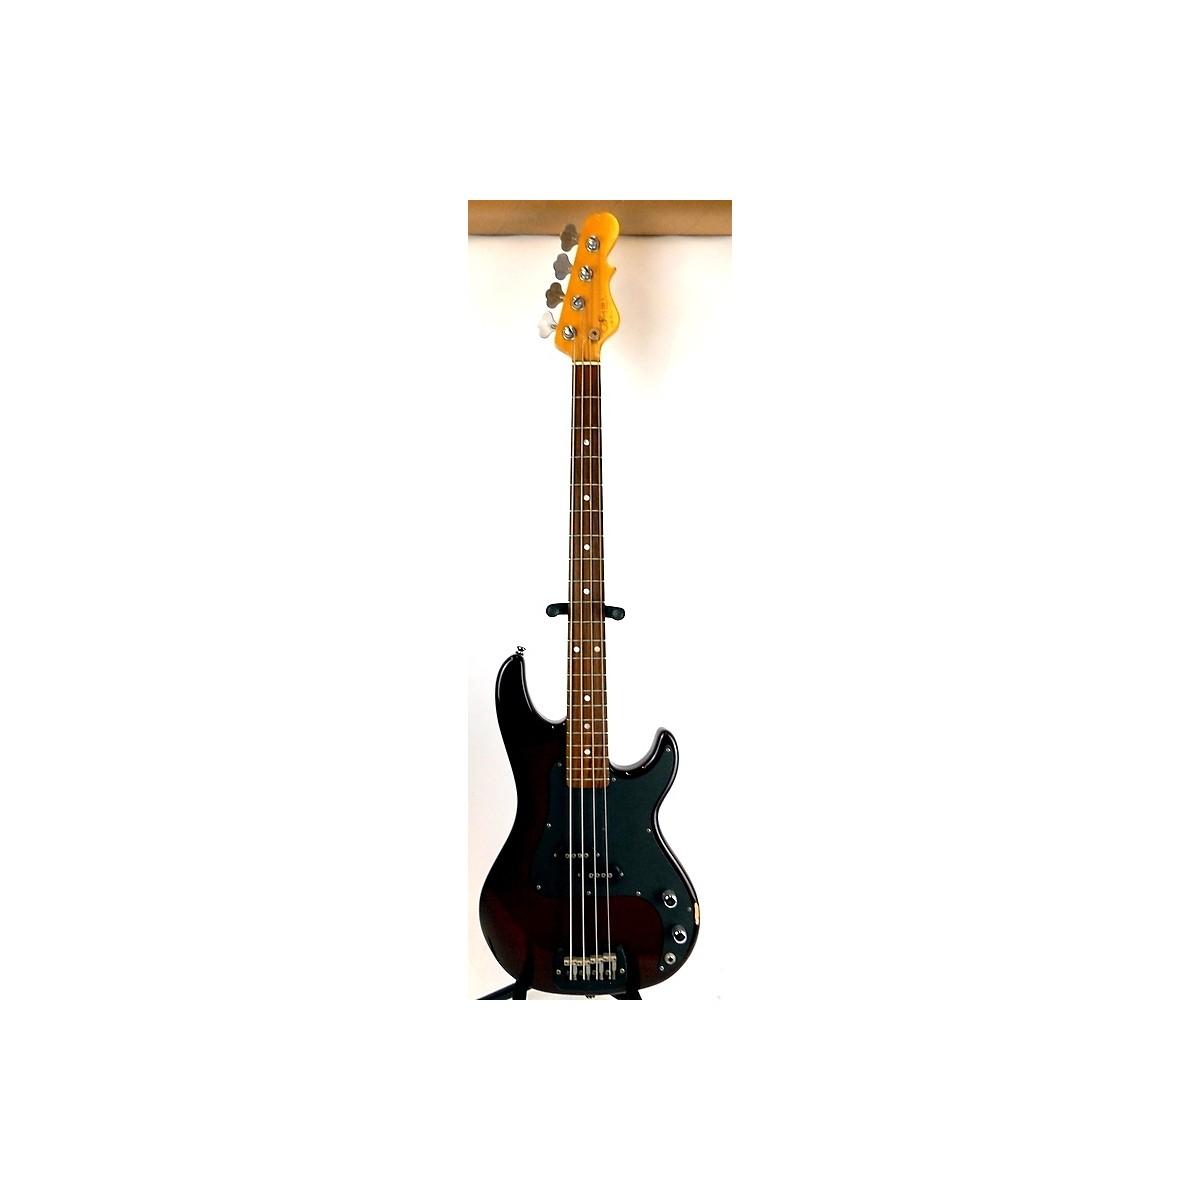 G&L 1990 SB1 Electric Bass Guitar